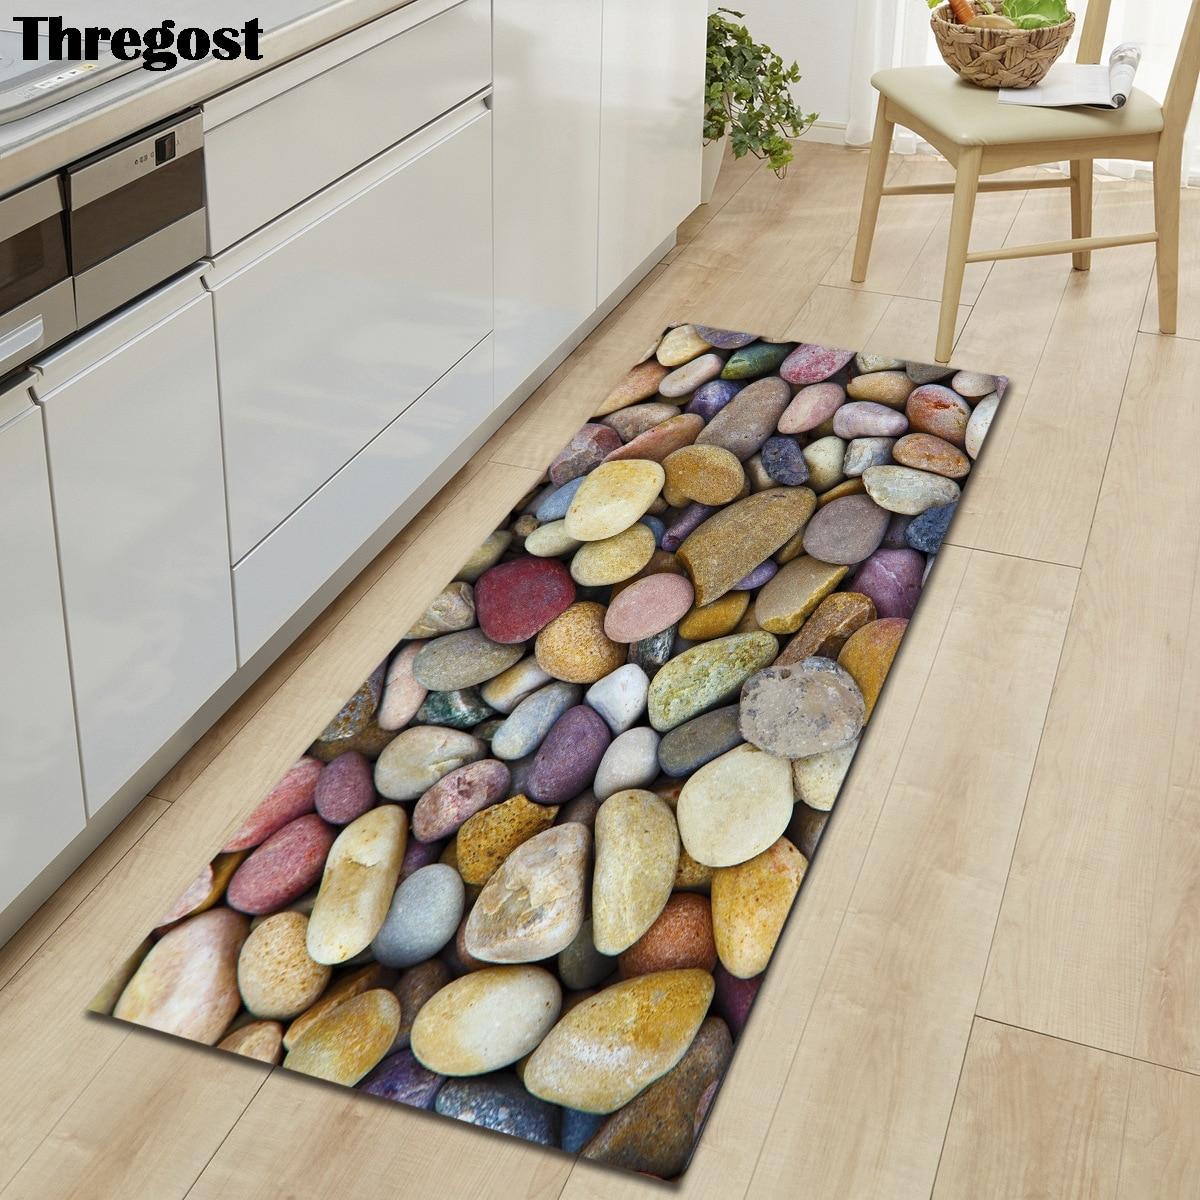 US $9.69 39% OFF 3D Stone Printed Long Floor Mats Microfiber Door Mat  Kitchen Carpet Anti Slip Washable Rugs for Kitchen Absorbent Doormat-in Mat  from ...